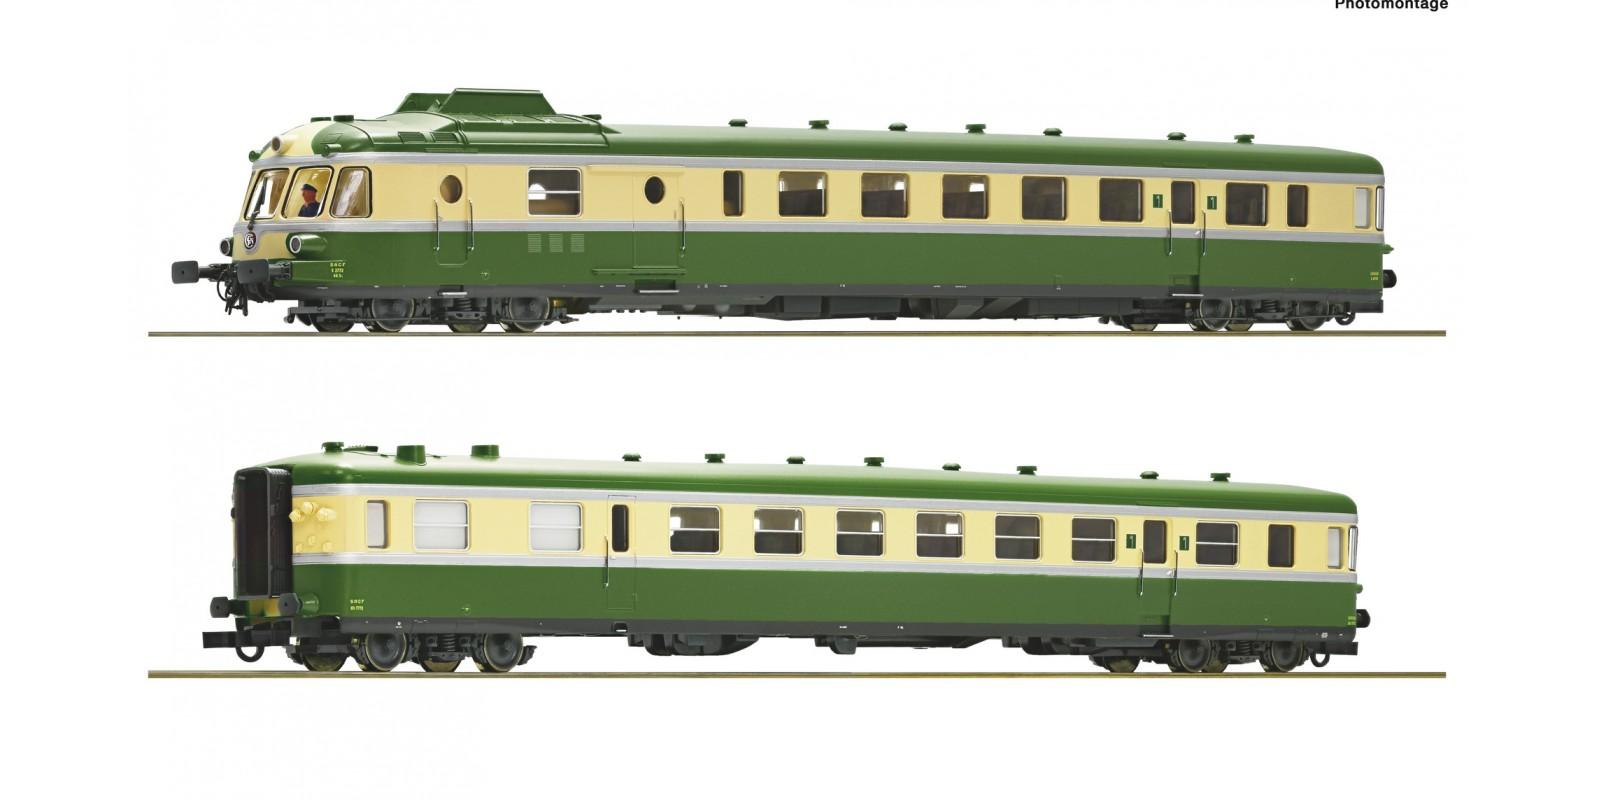 RO73006 Triebzug X2700 grün/beige